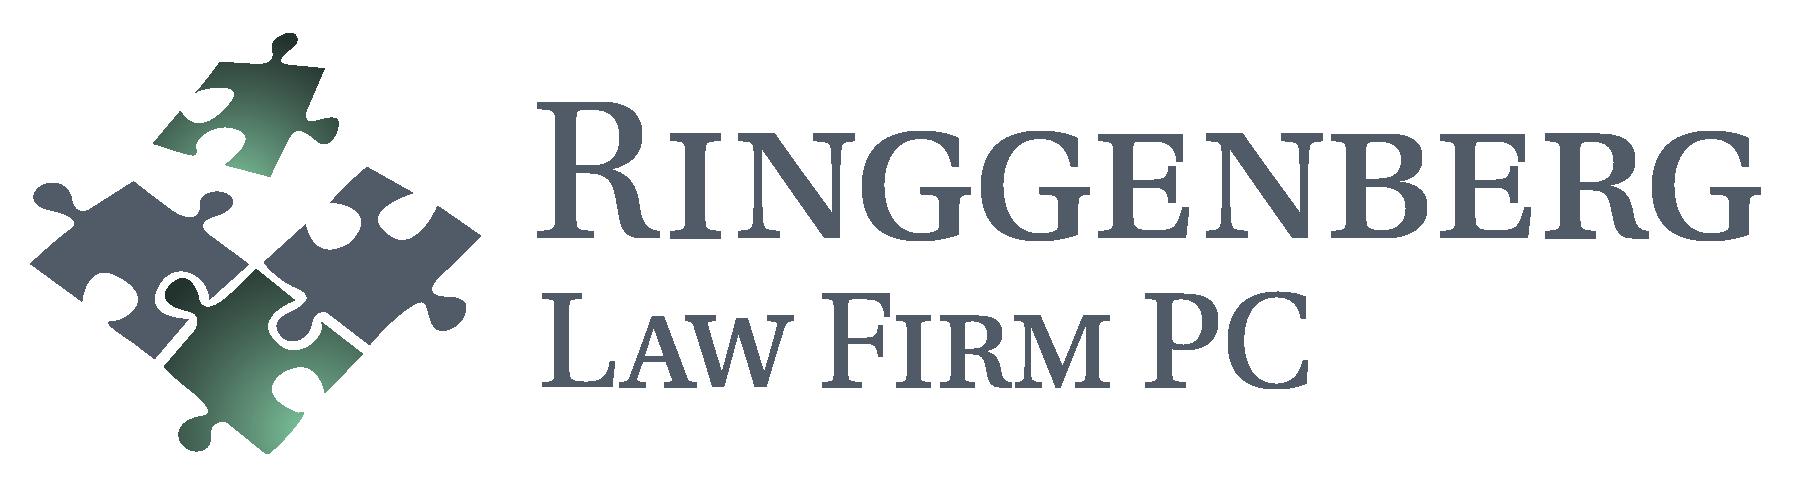 RINGGENBERG LAW FIRM